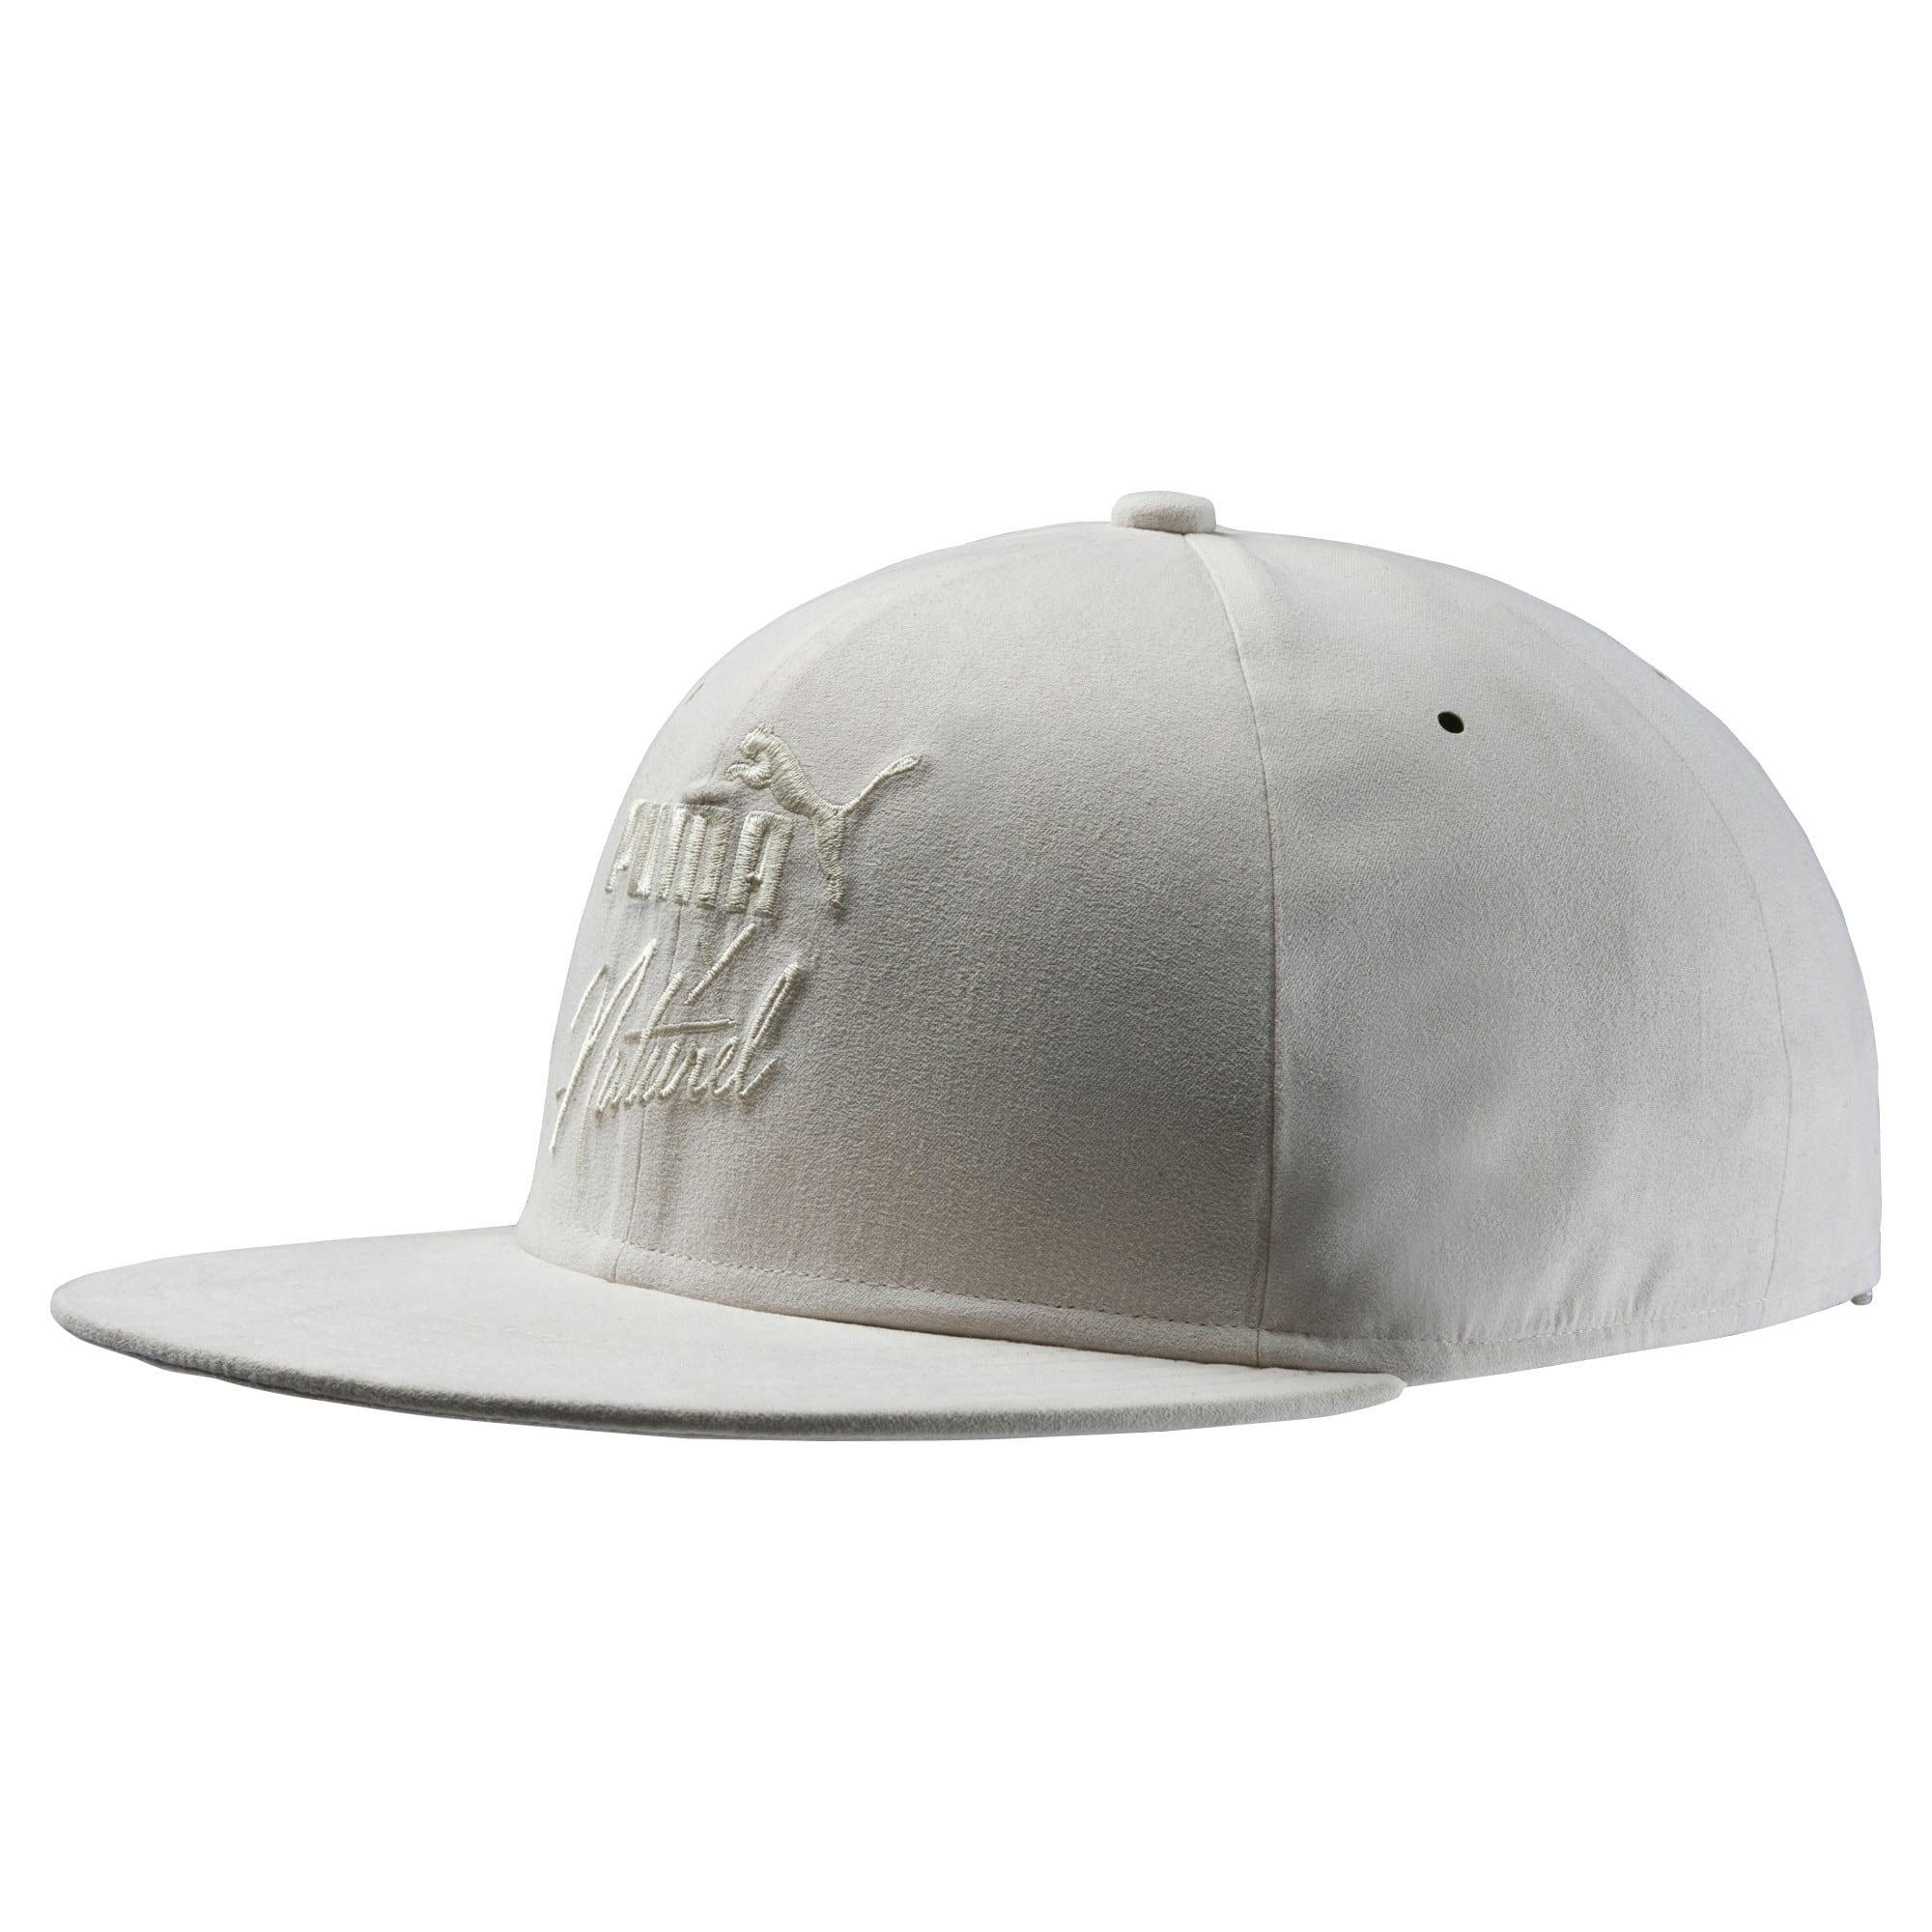 Thumbnail 1 of PUMA x NATUREL Hat, Whisper White, medium